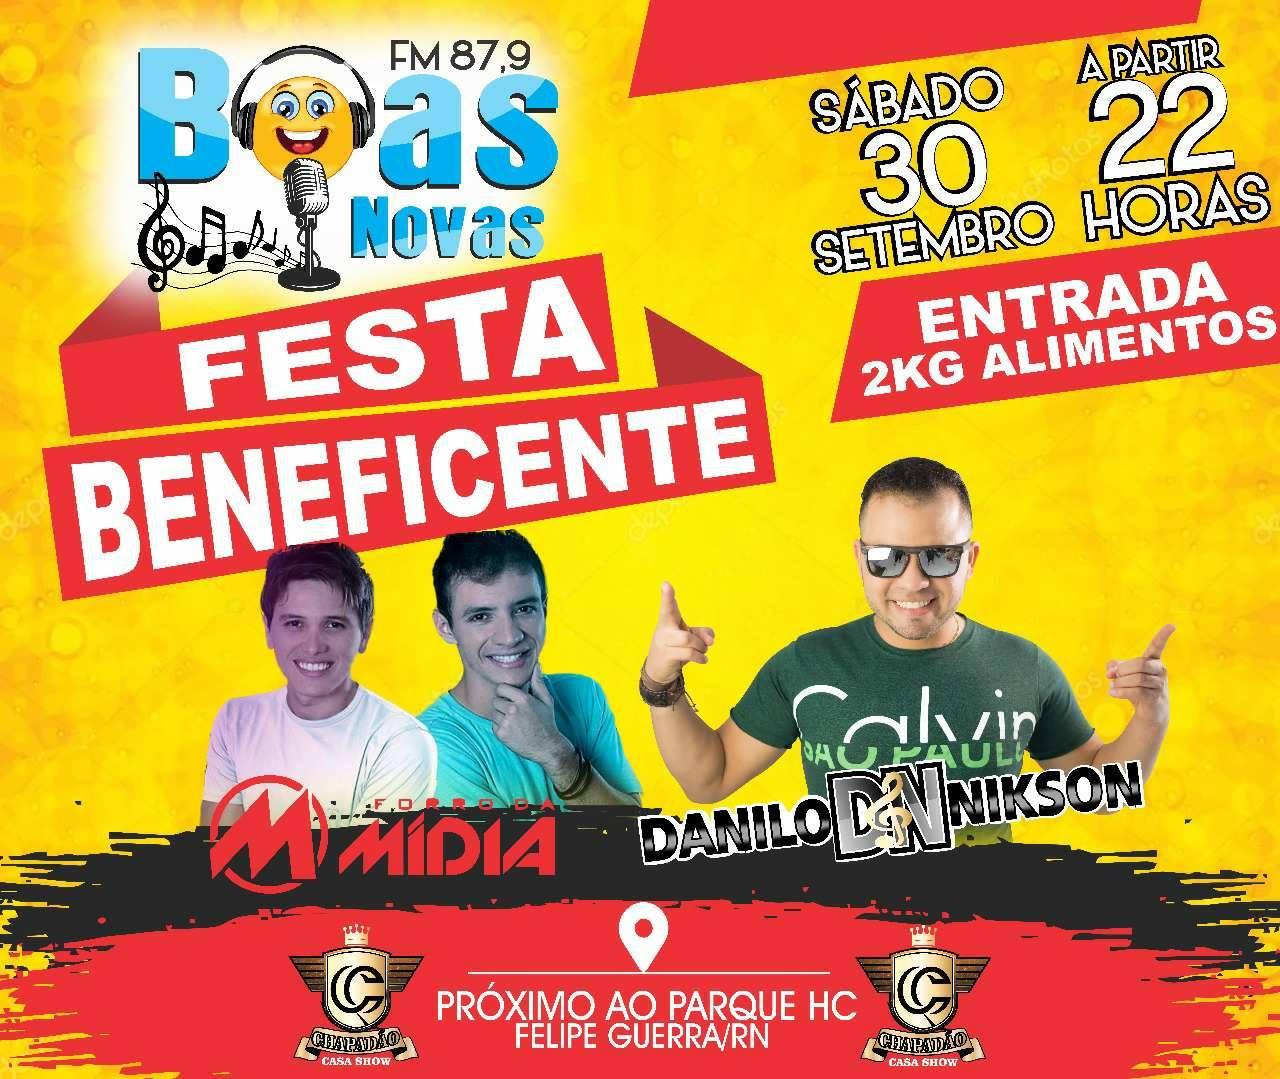 FESTA BENEFICENTE BOAS NOVAS FM